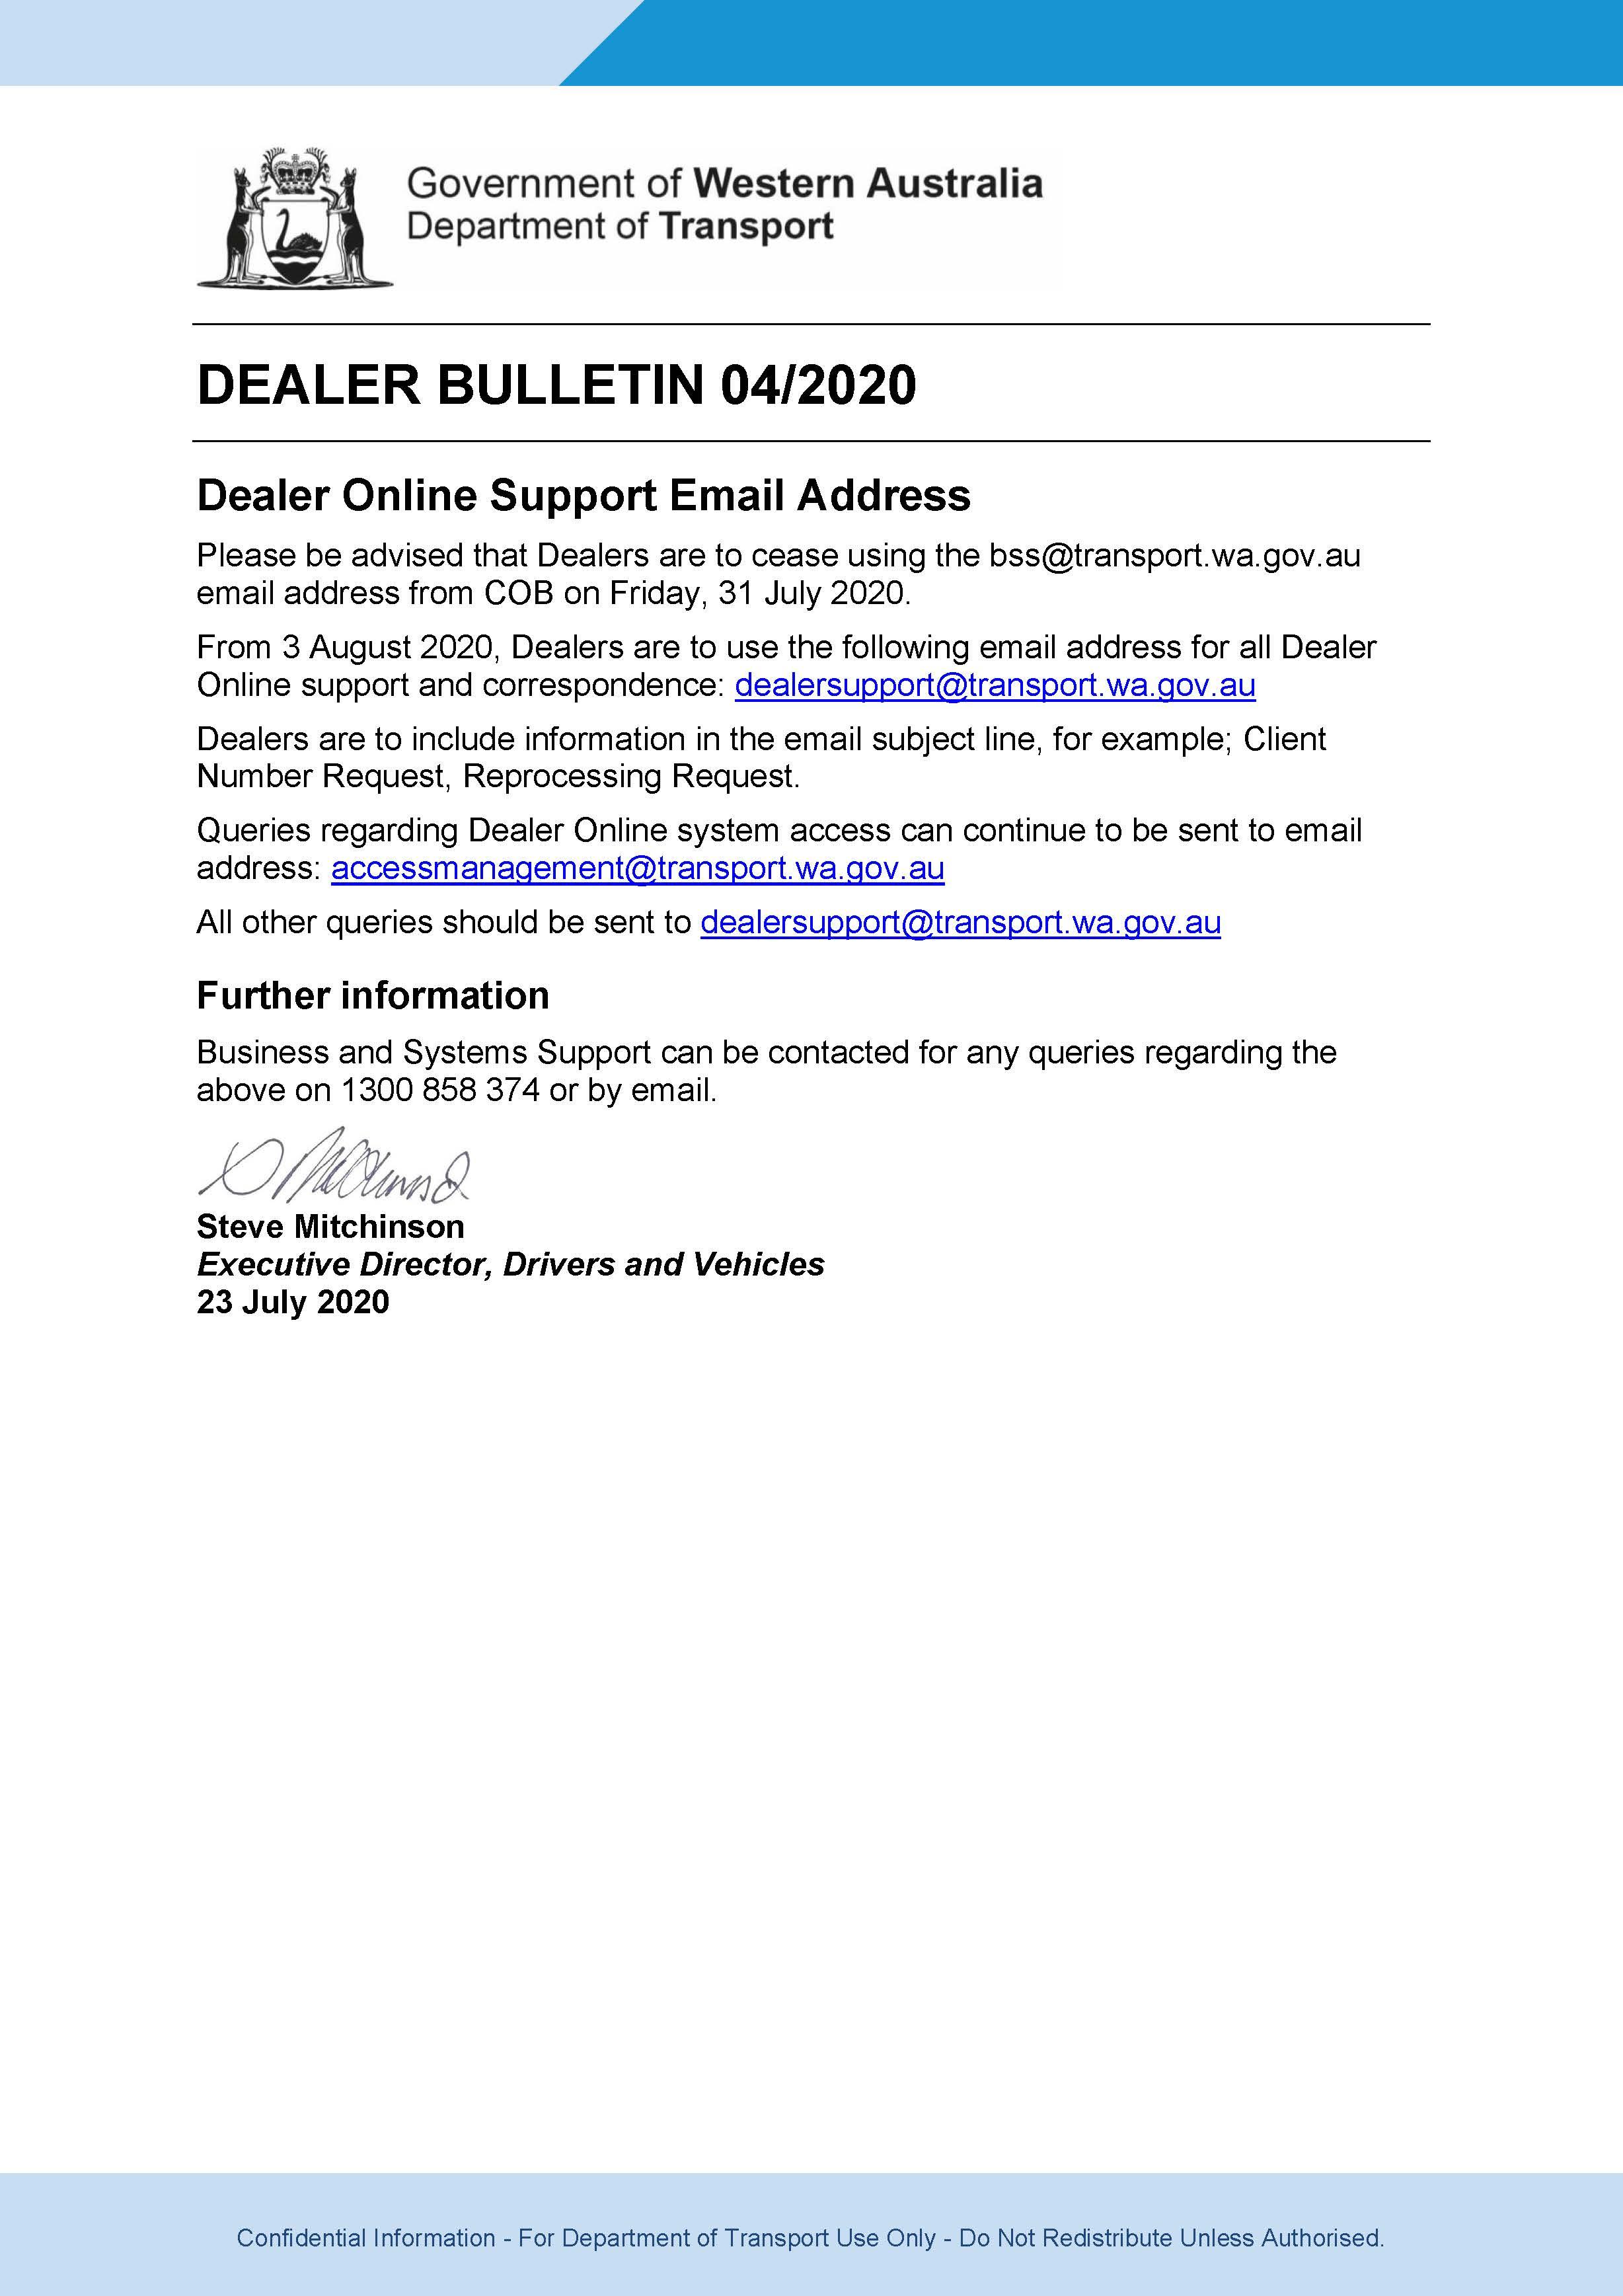 DoT Dealer Bulletin - July 2020